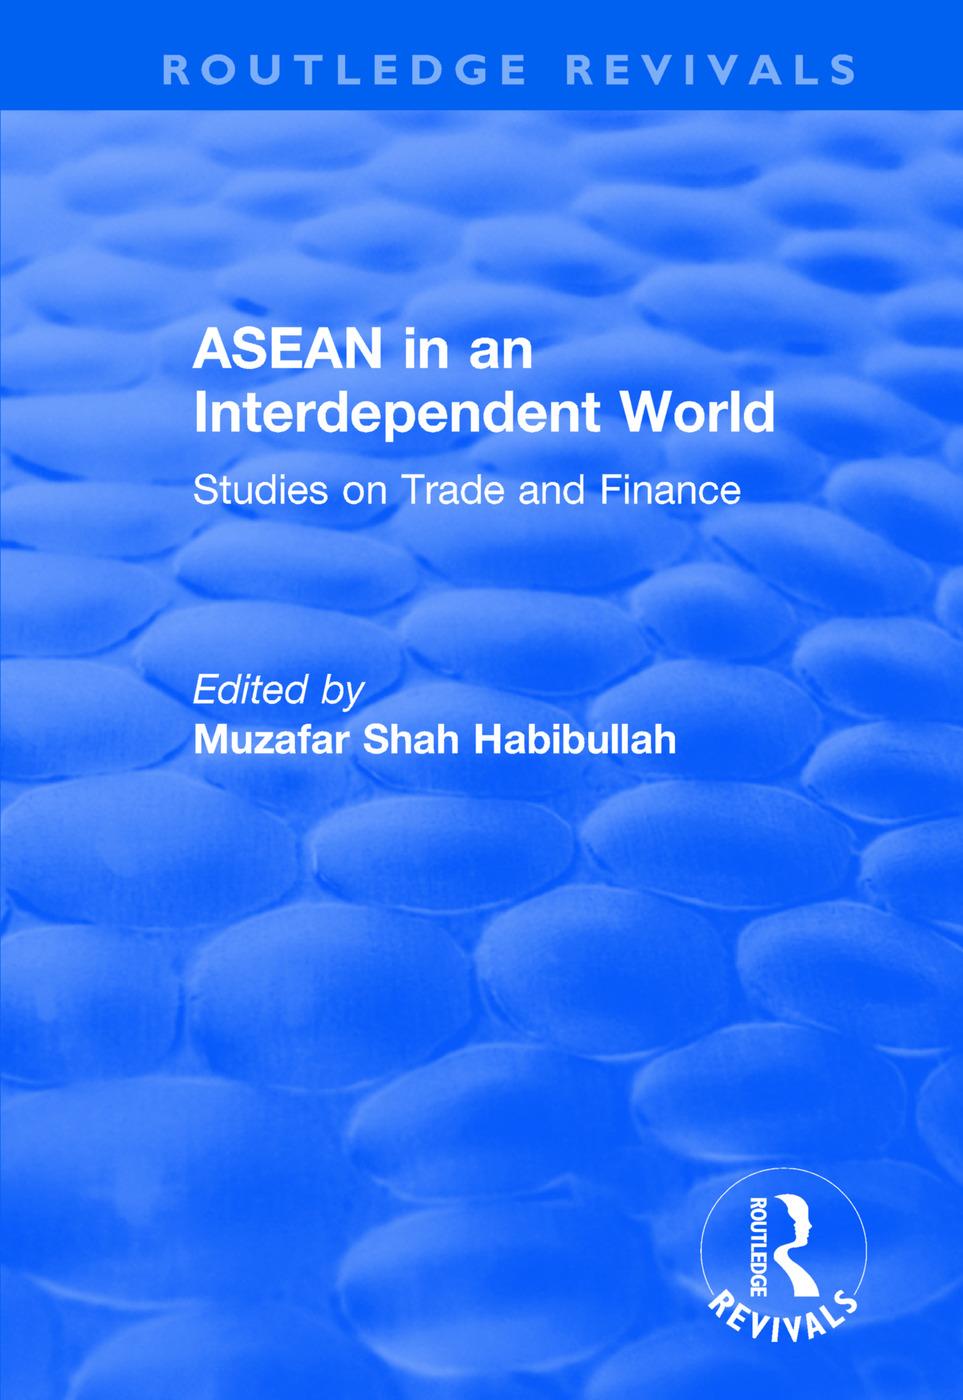 ASEAN in an Interdependent World: Studies in an Interdependent World